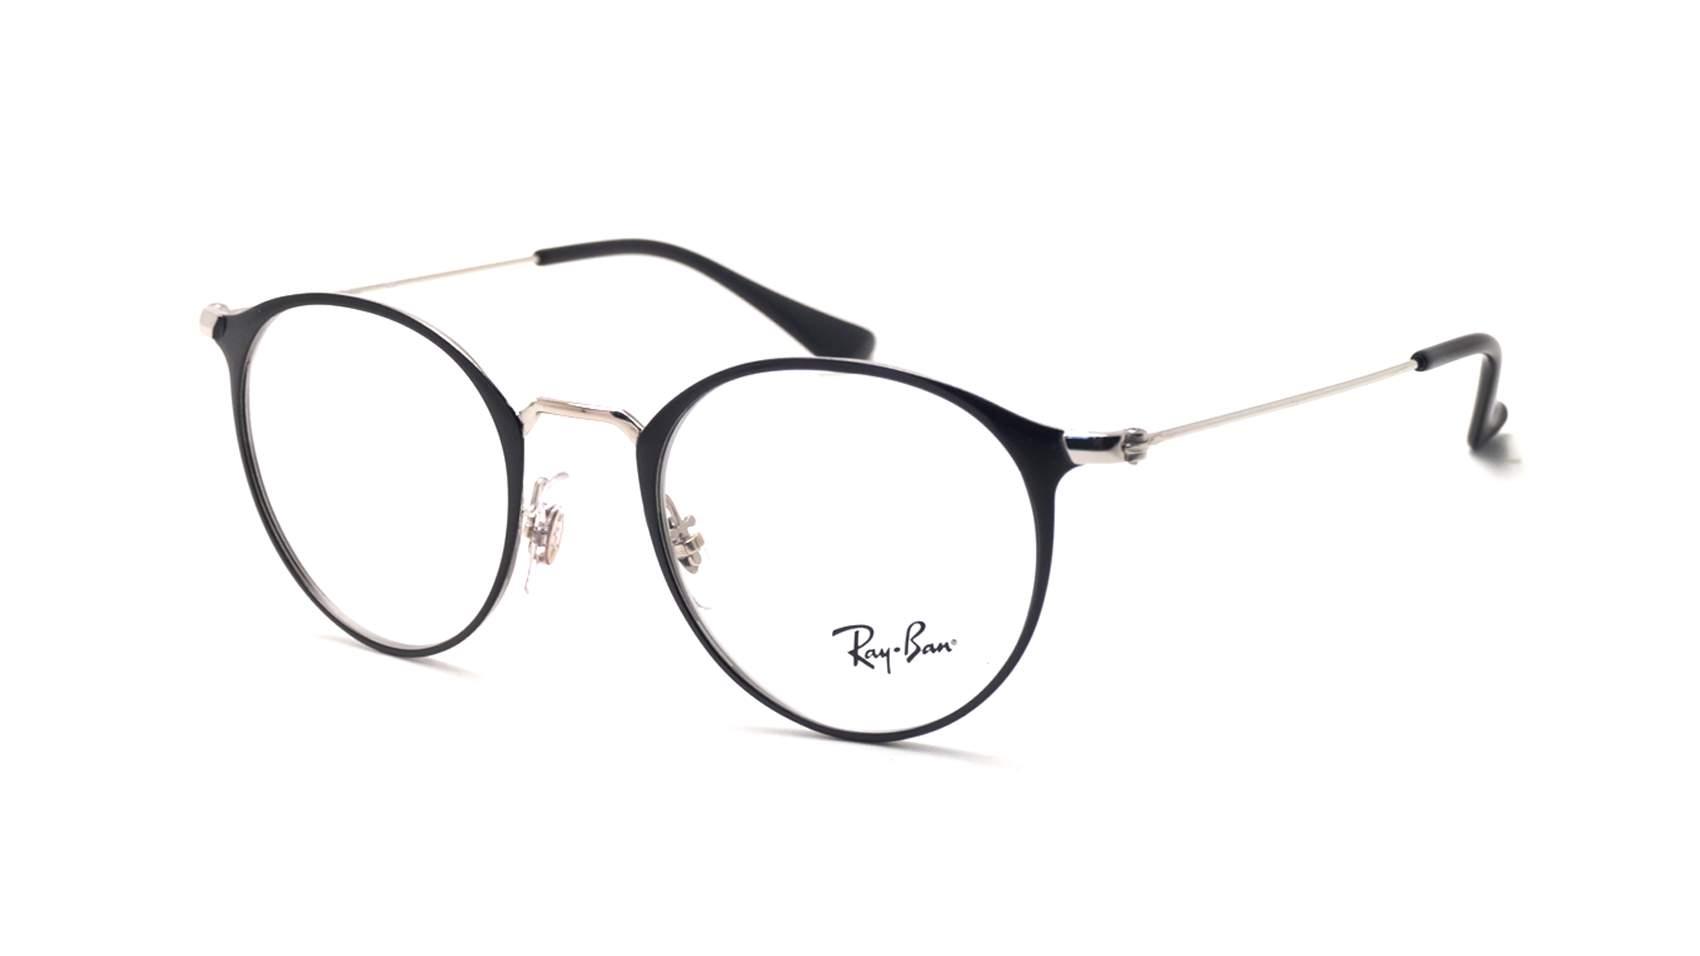 32db148ced Eyeglasses Ray-Ban Highstreet Black RX6378 RB6378 2861 47-21 Small